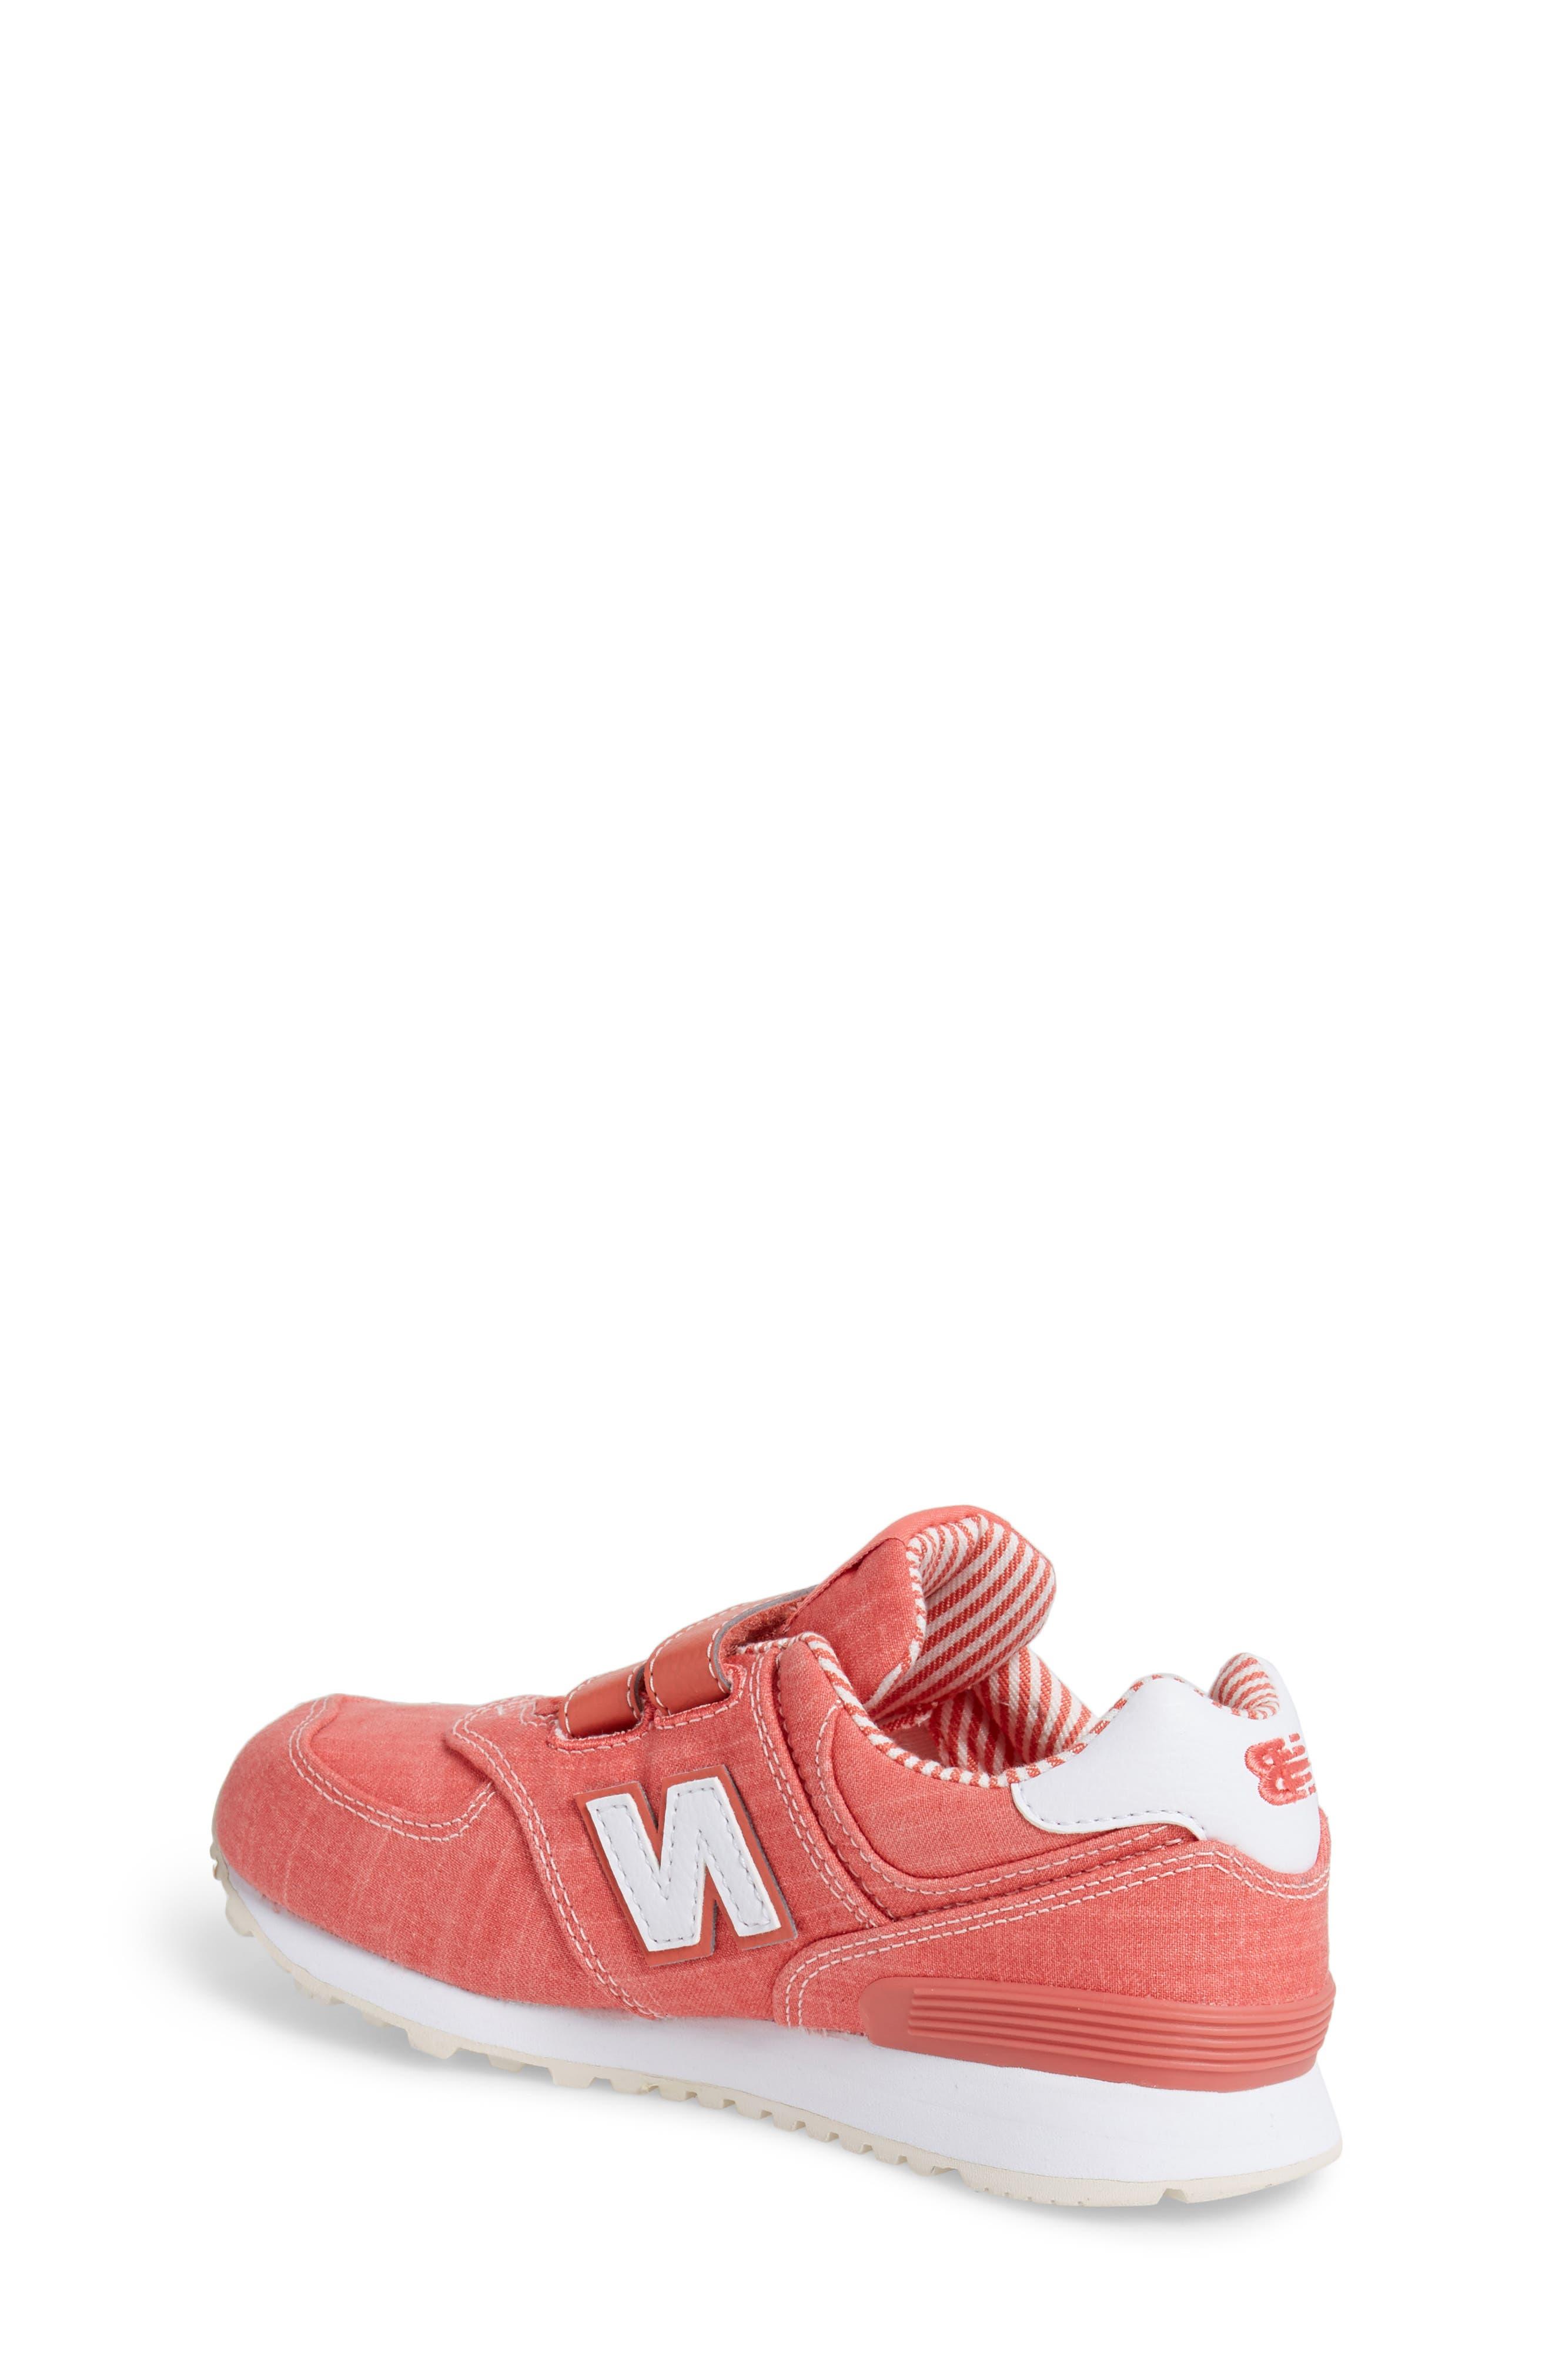 574v1 Sneaker,                             Alternate thumbnail 2, color,                             Coral